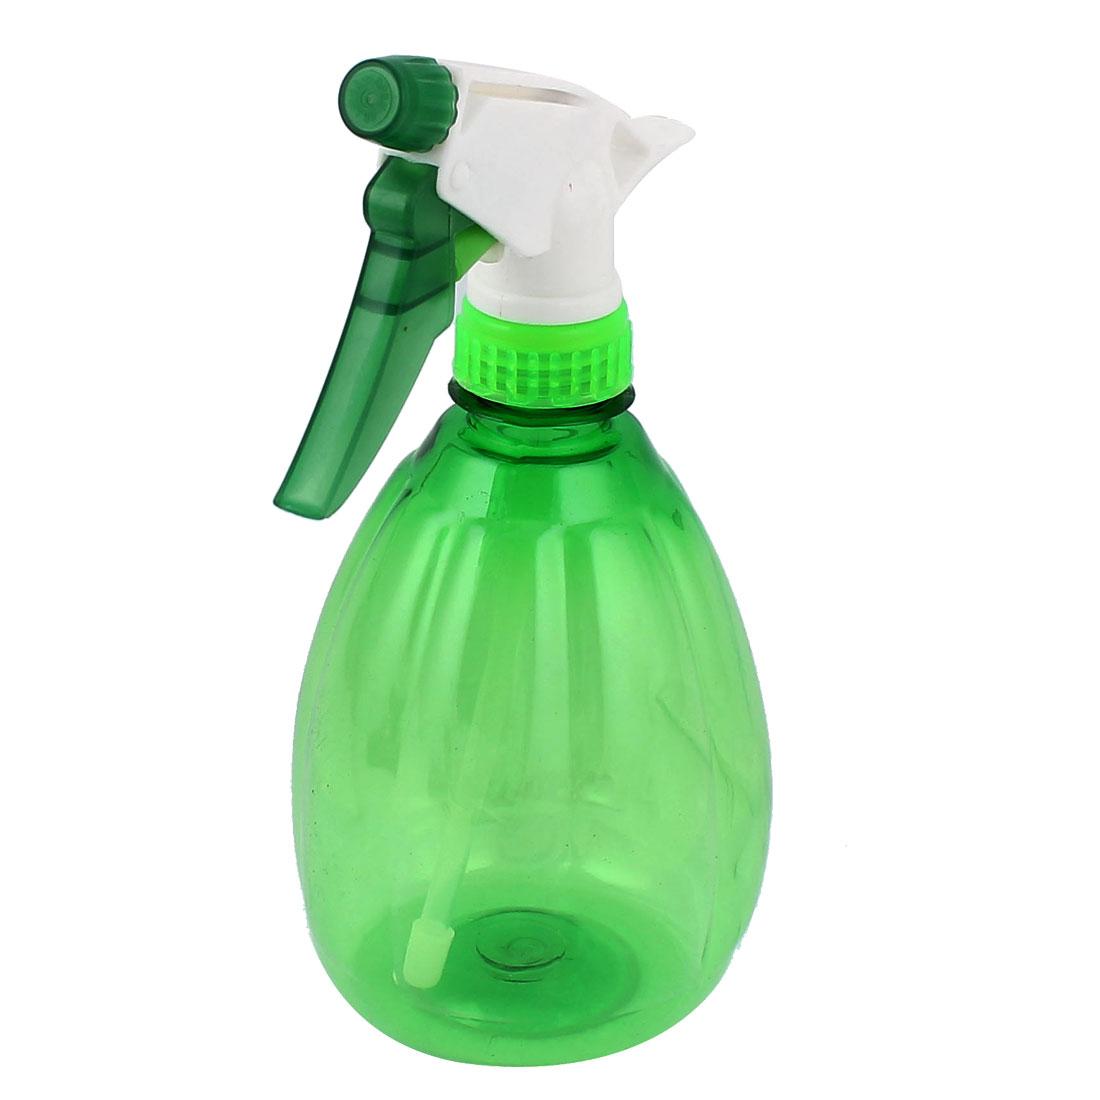 Hair Salon Gardening Nozzle Head Water Sprayer Trigger Spray Bottle Green 500ml